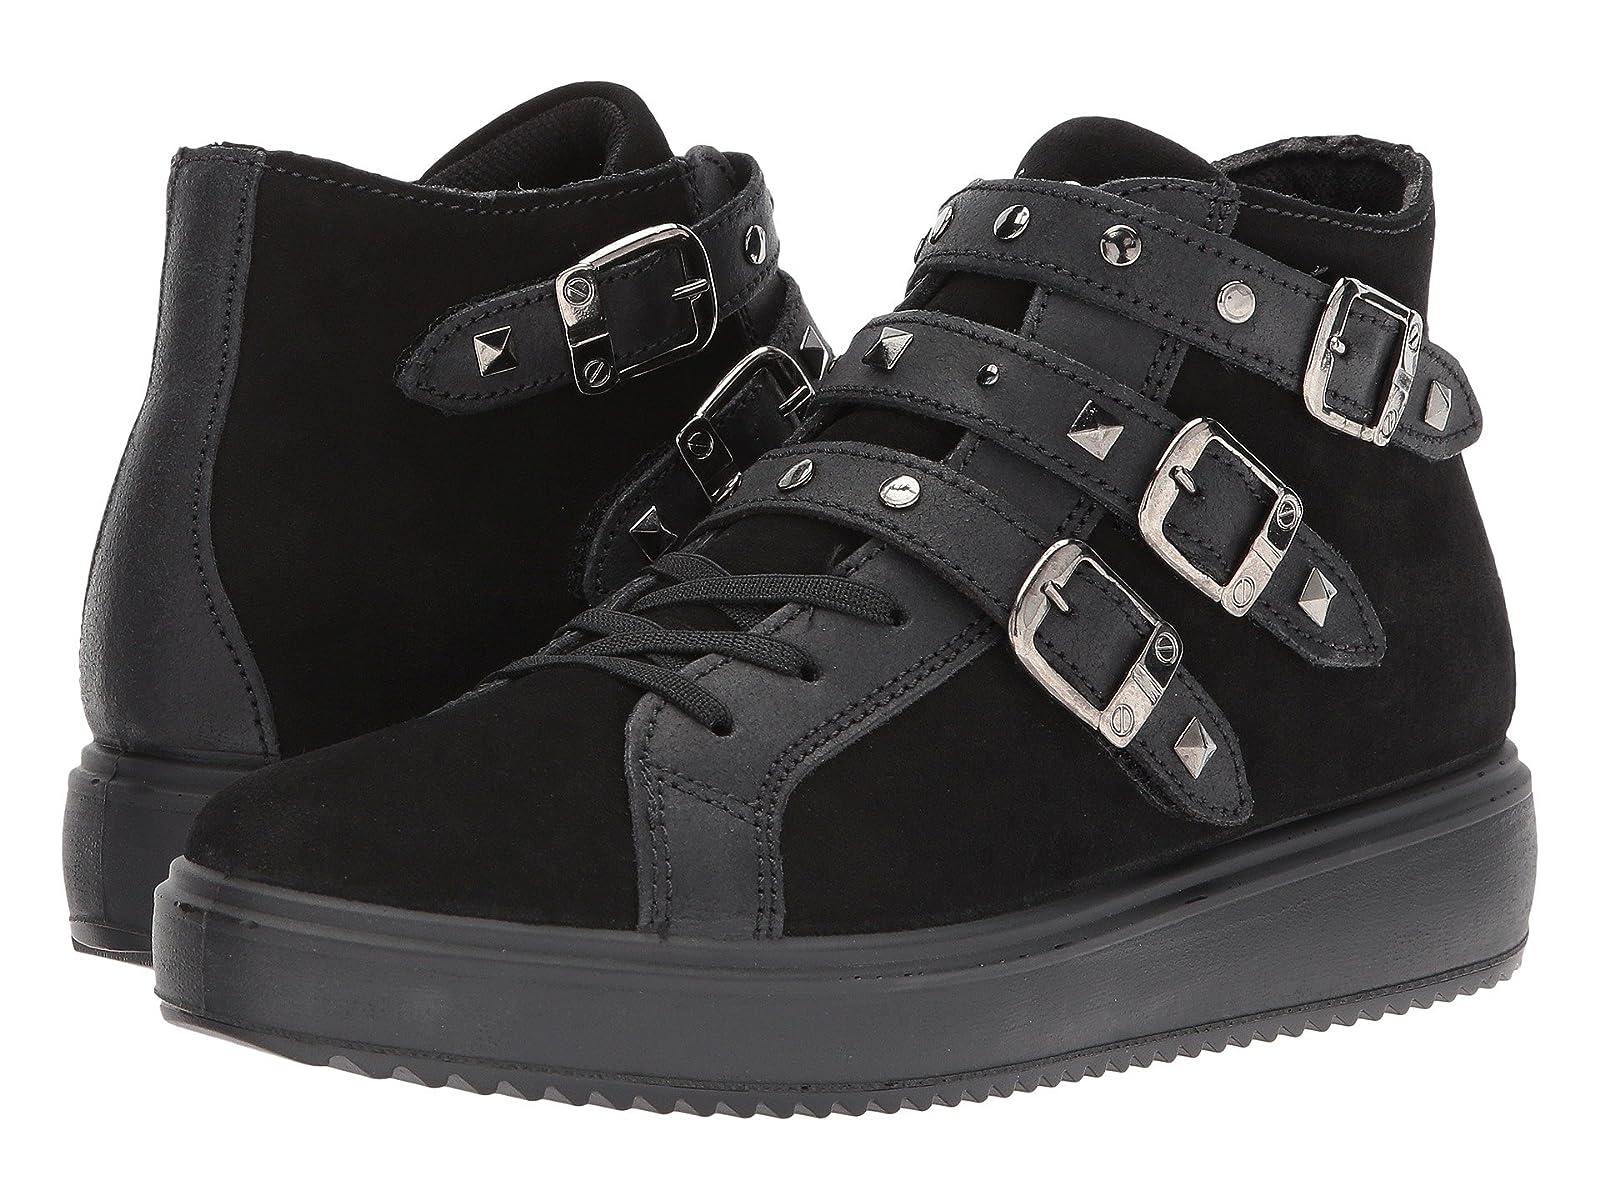 Primigi Kids PAI 8562 (Big Kid)Cheap and distinctive eye-catching shoes